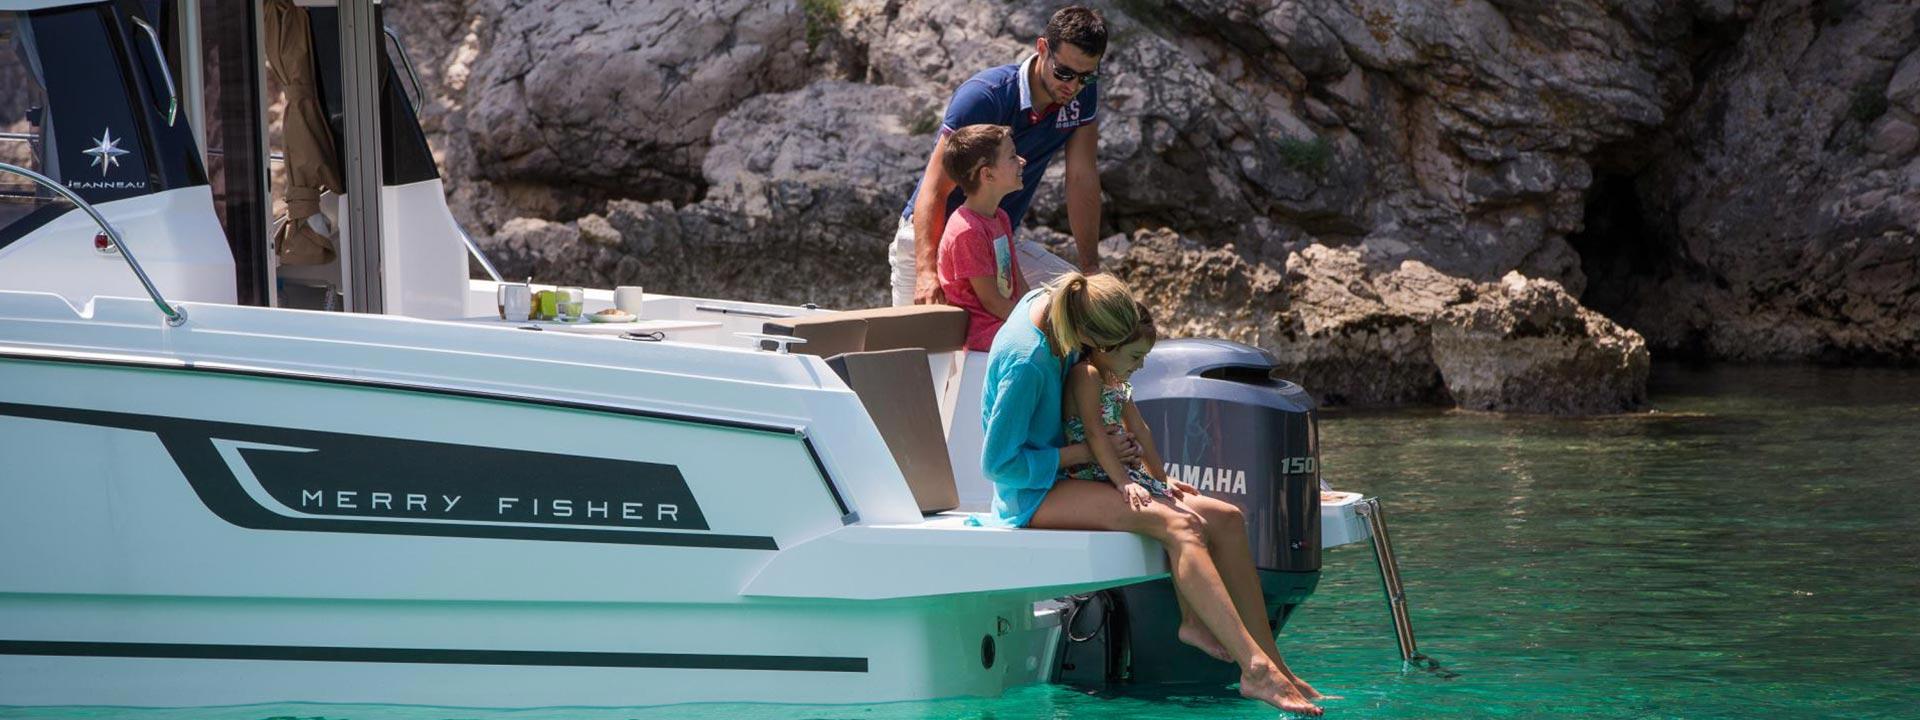 mayer-charter-boat-header-jeanneau-merry-fisher-795-02